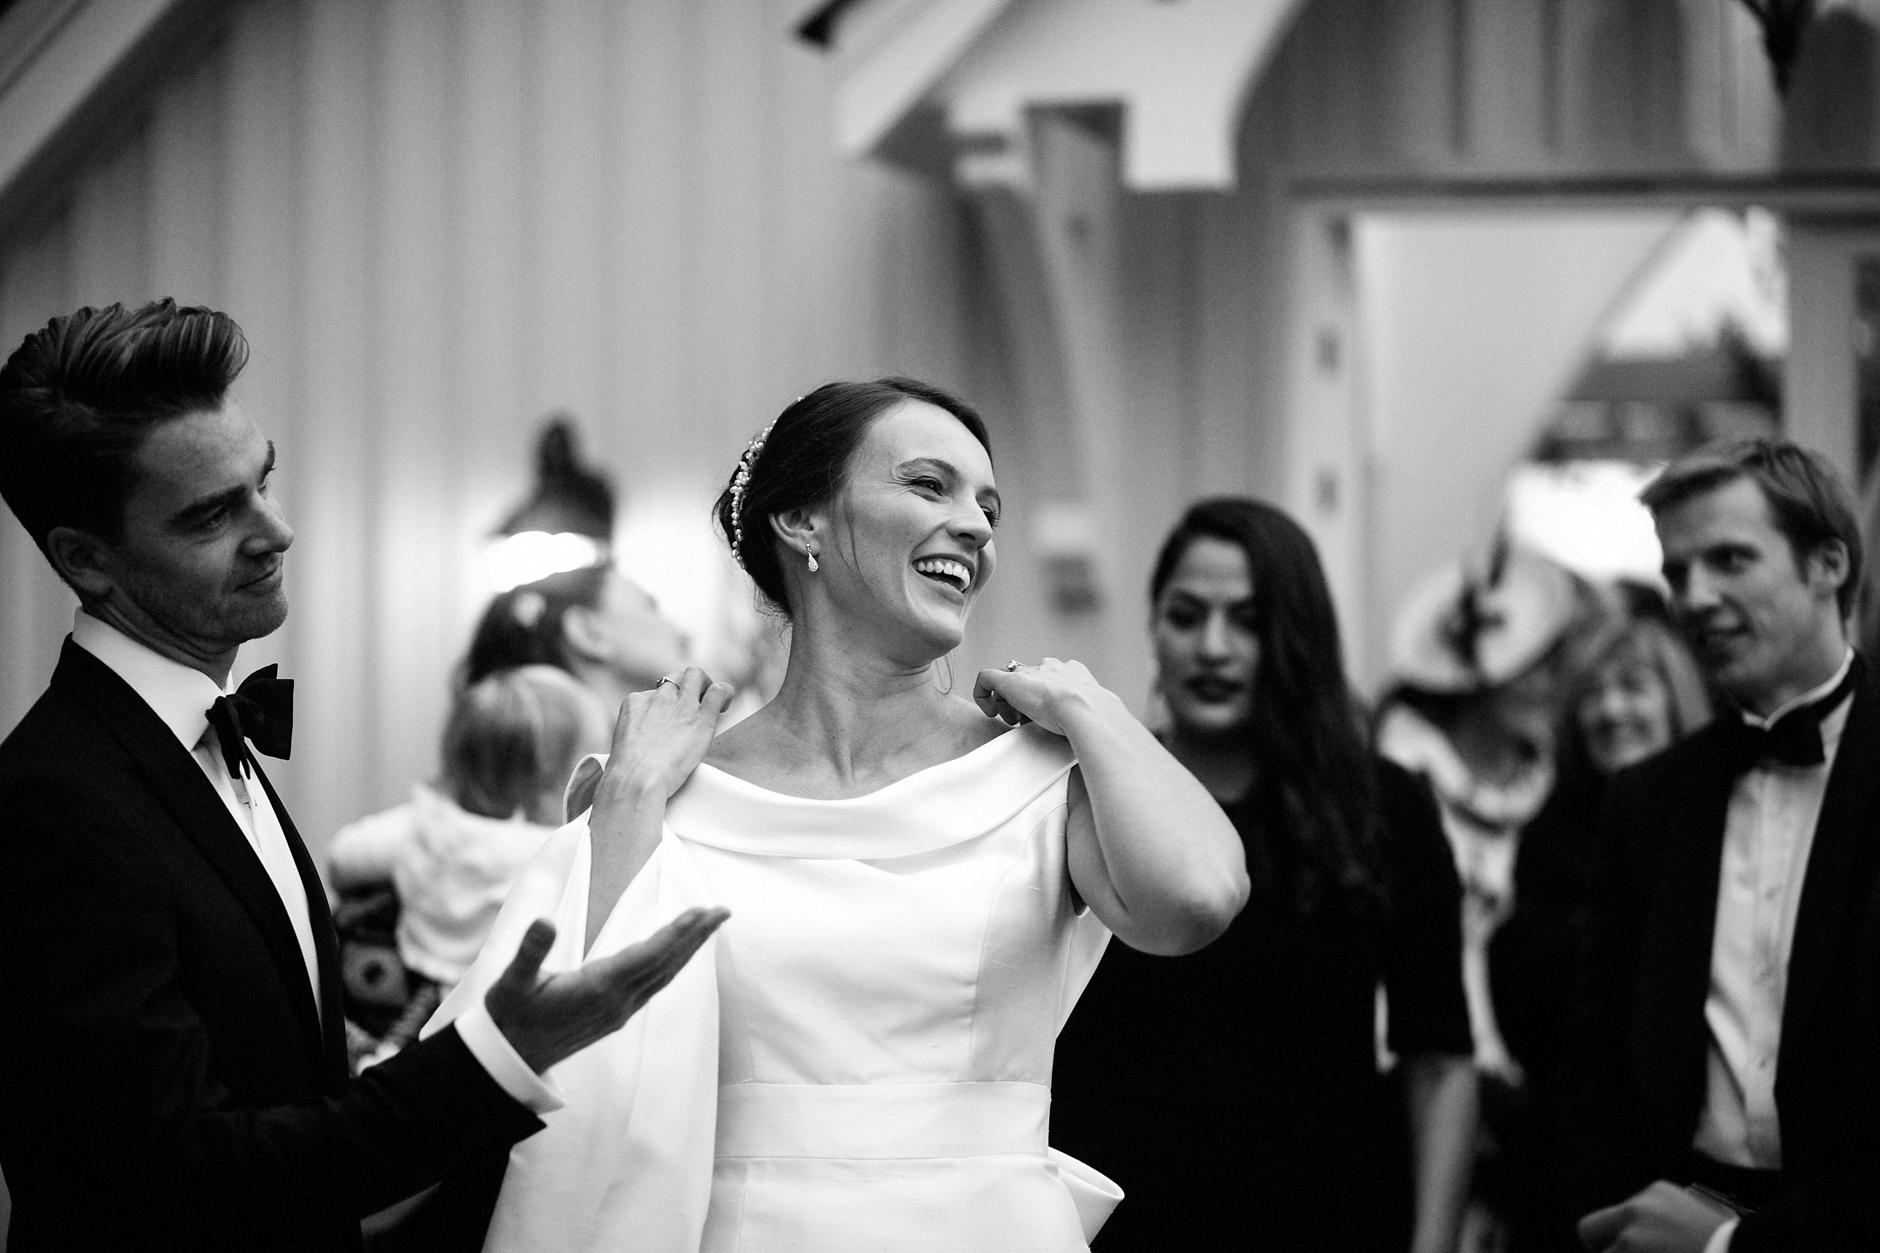 Glentruim-Wedding-Nikki-Leadbetter-Photography-124.jpg